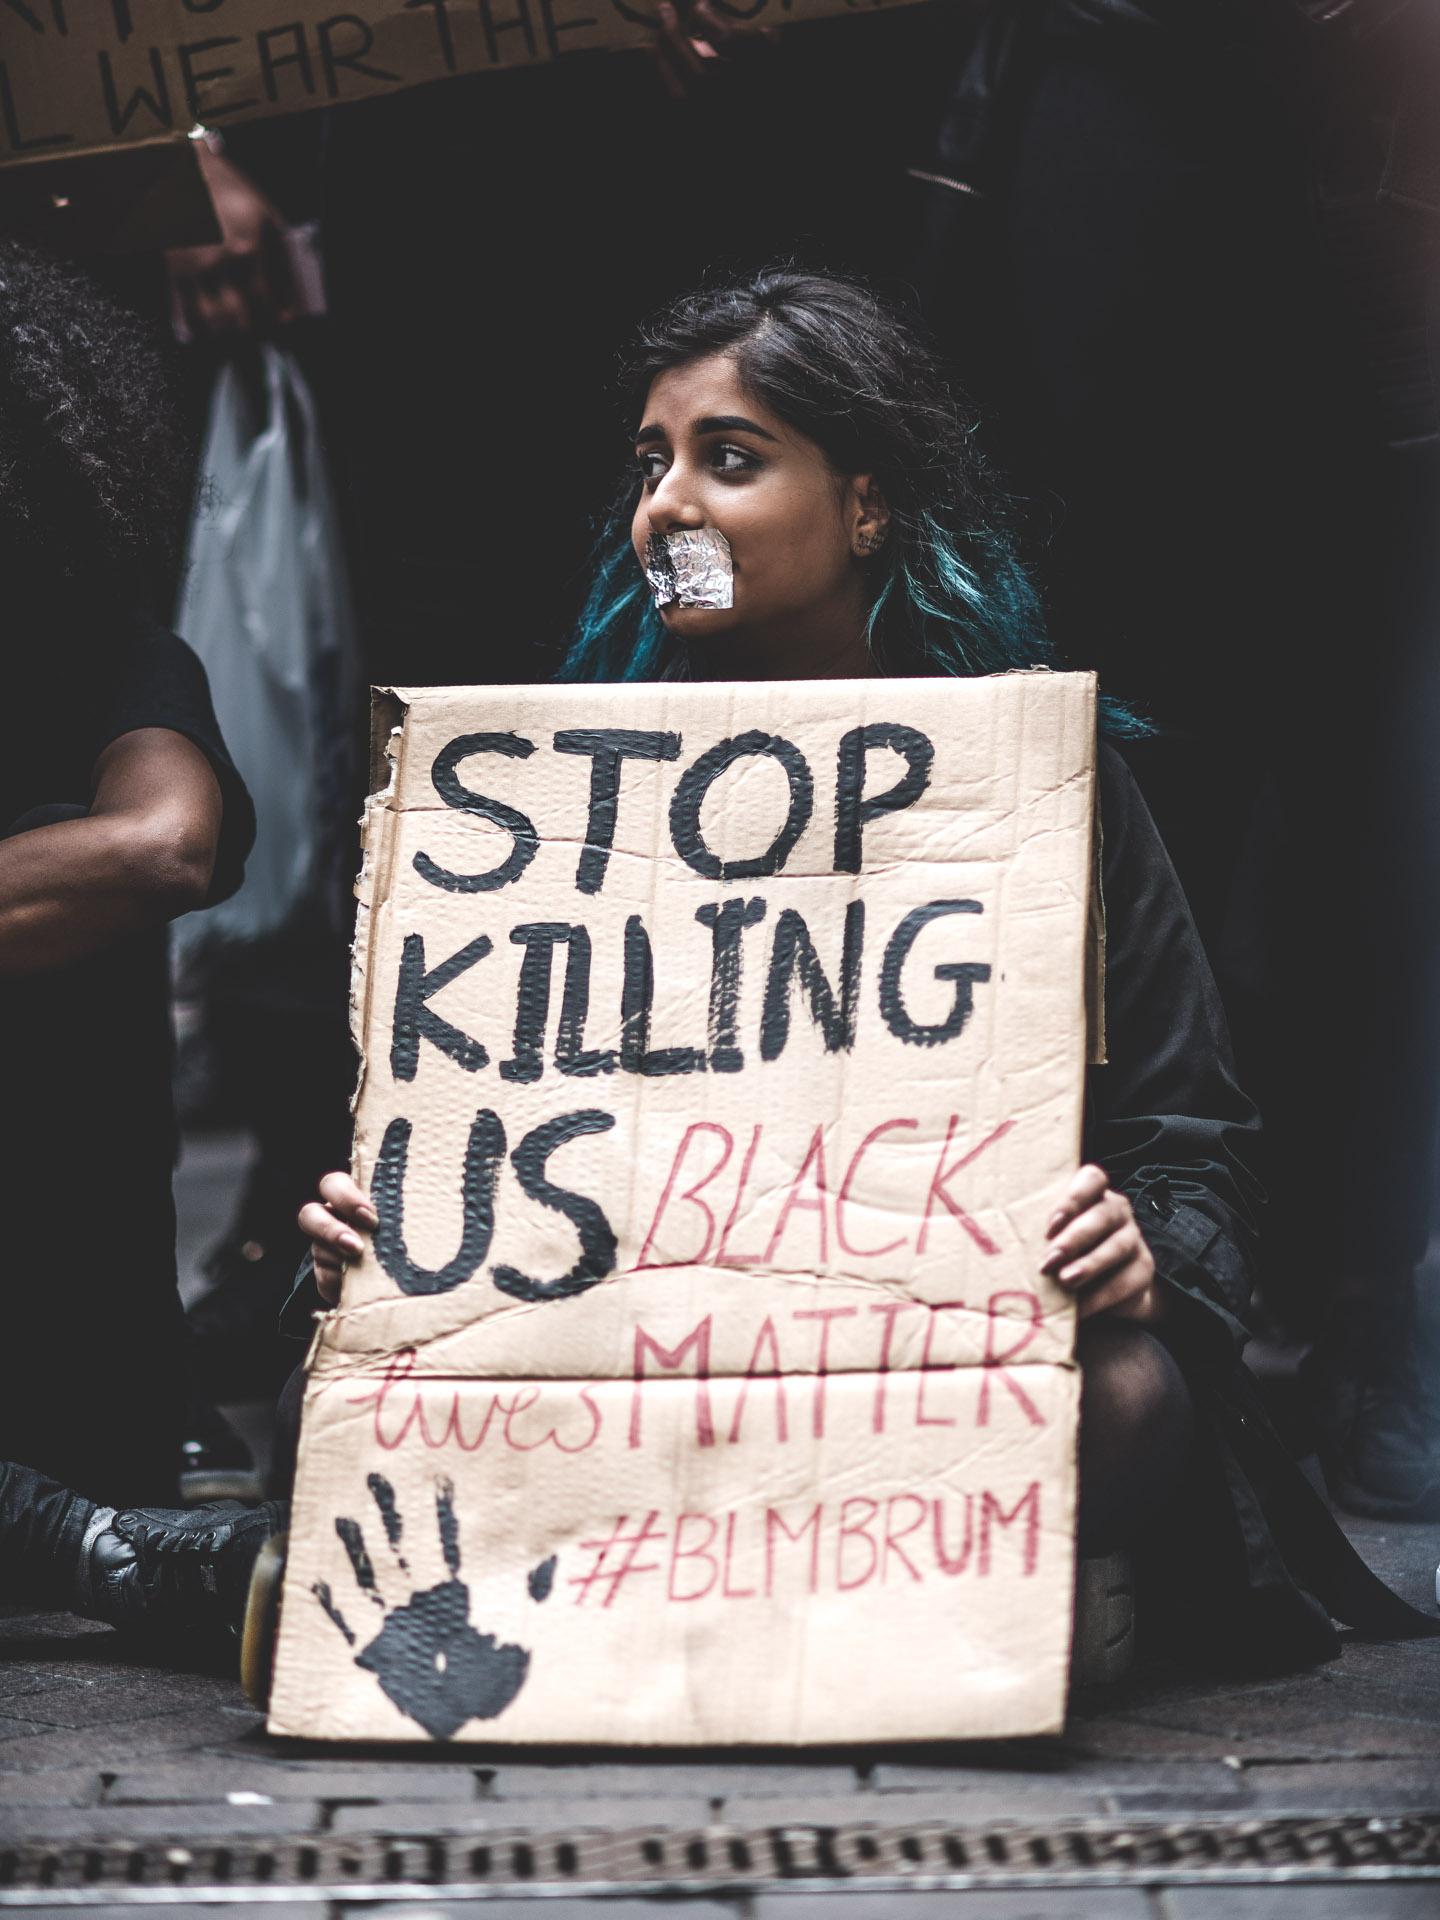 BlackLivesMatter-Bham-20160709-0090-Kris-Askey.jpg